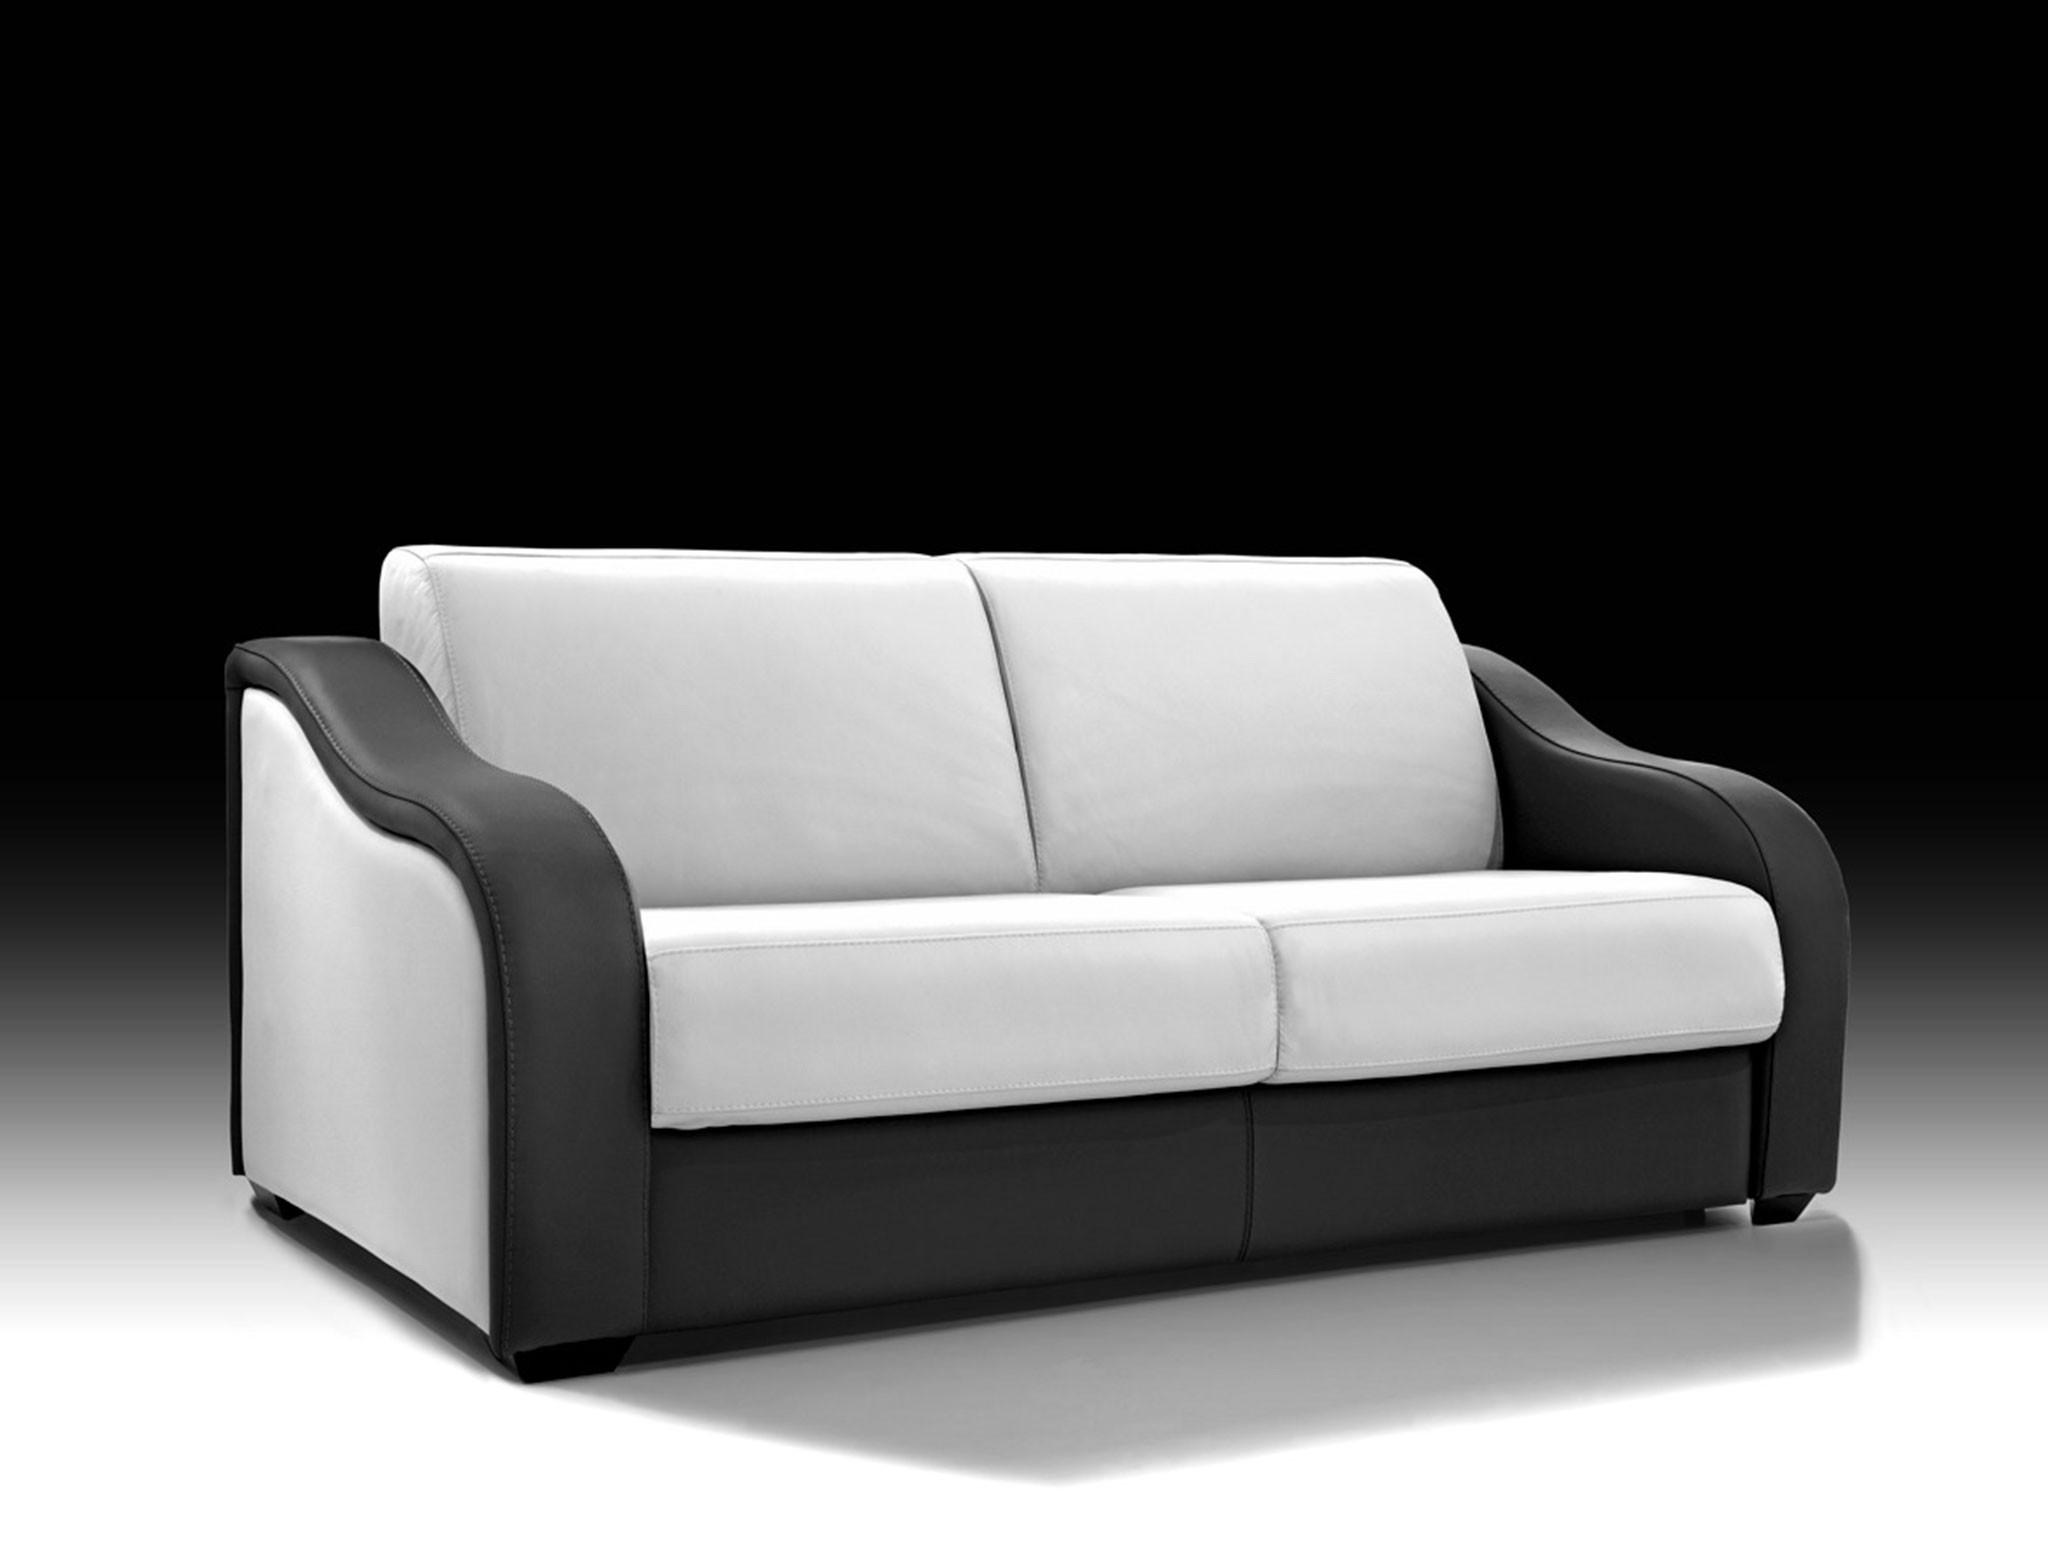 Canape Convertible Cuir Design